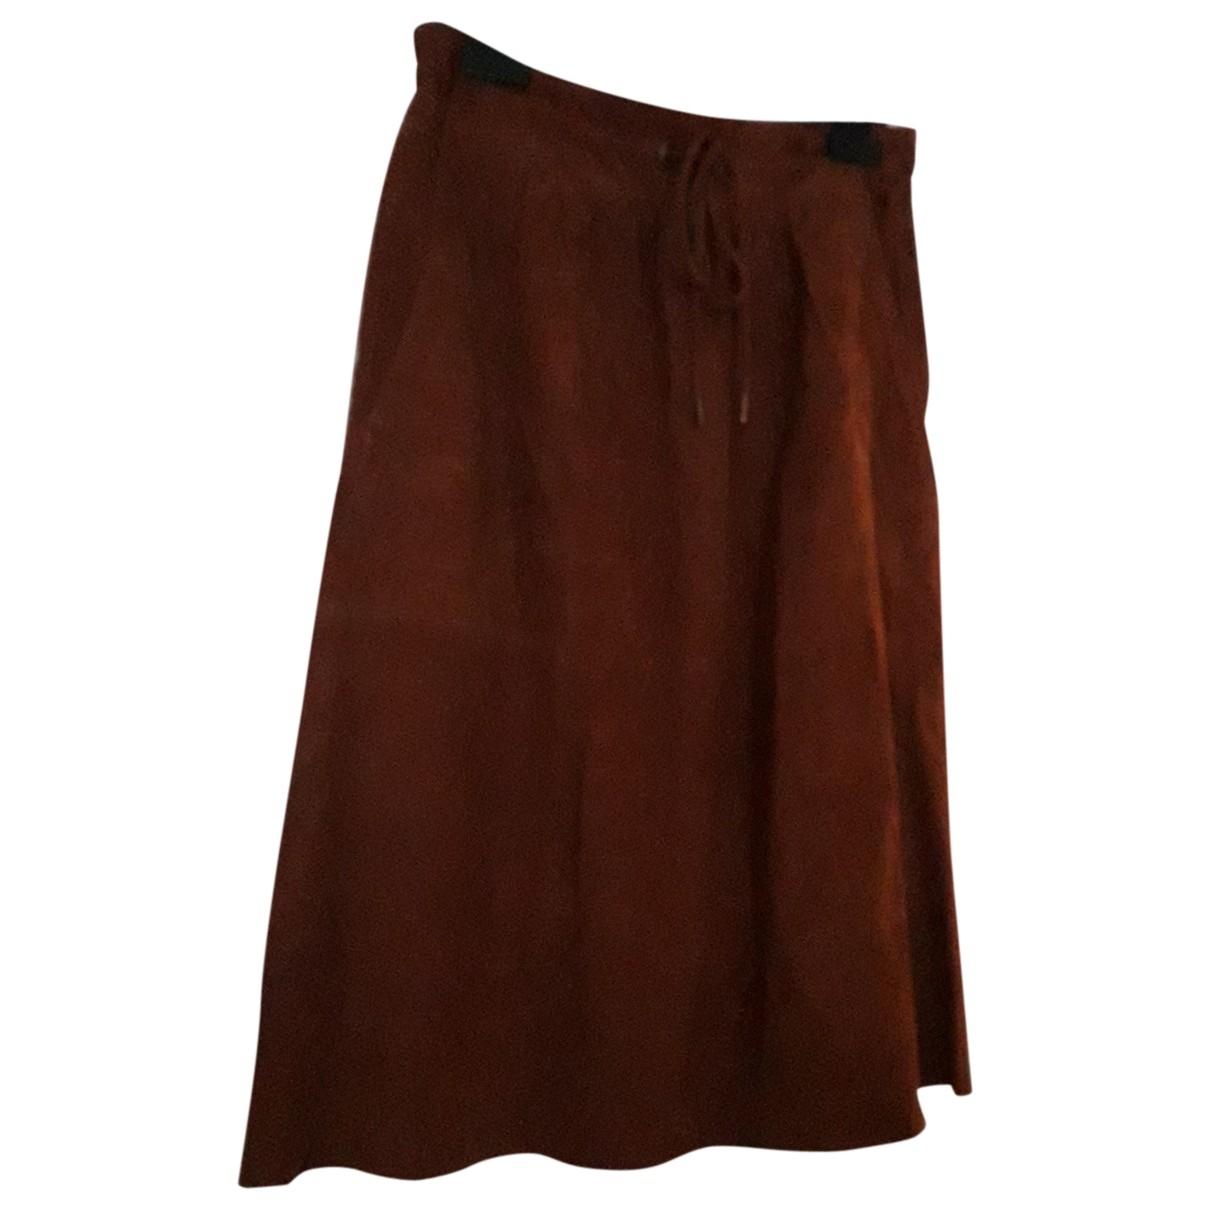 Les Petites \N Brown Leather skirt for Women 36 FR